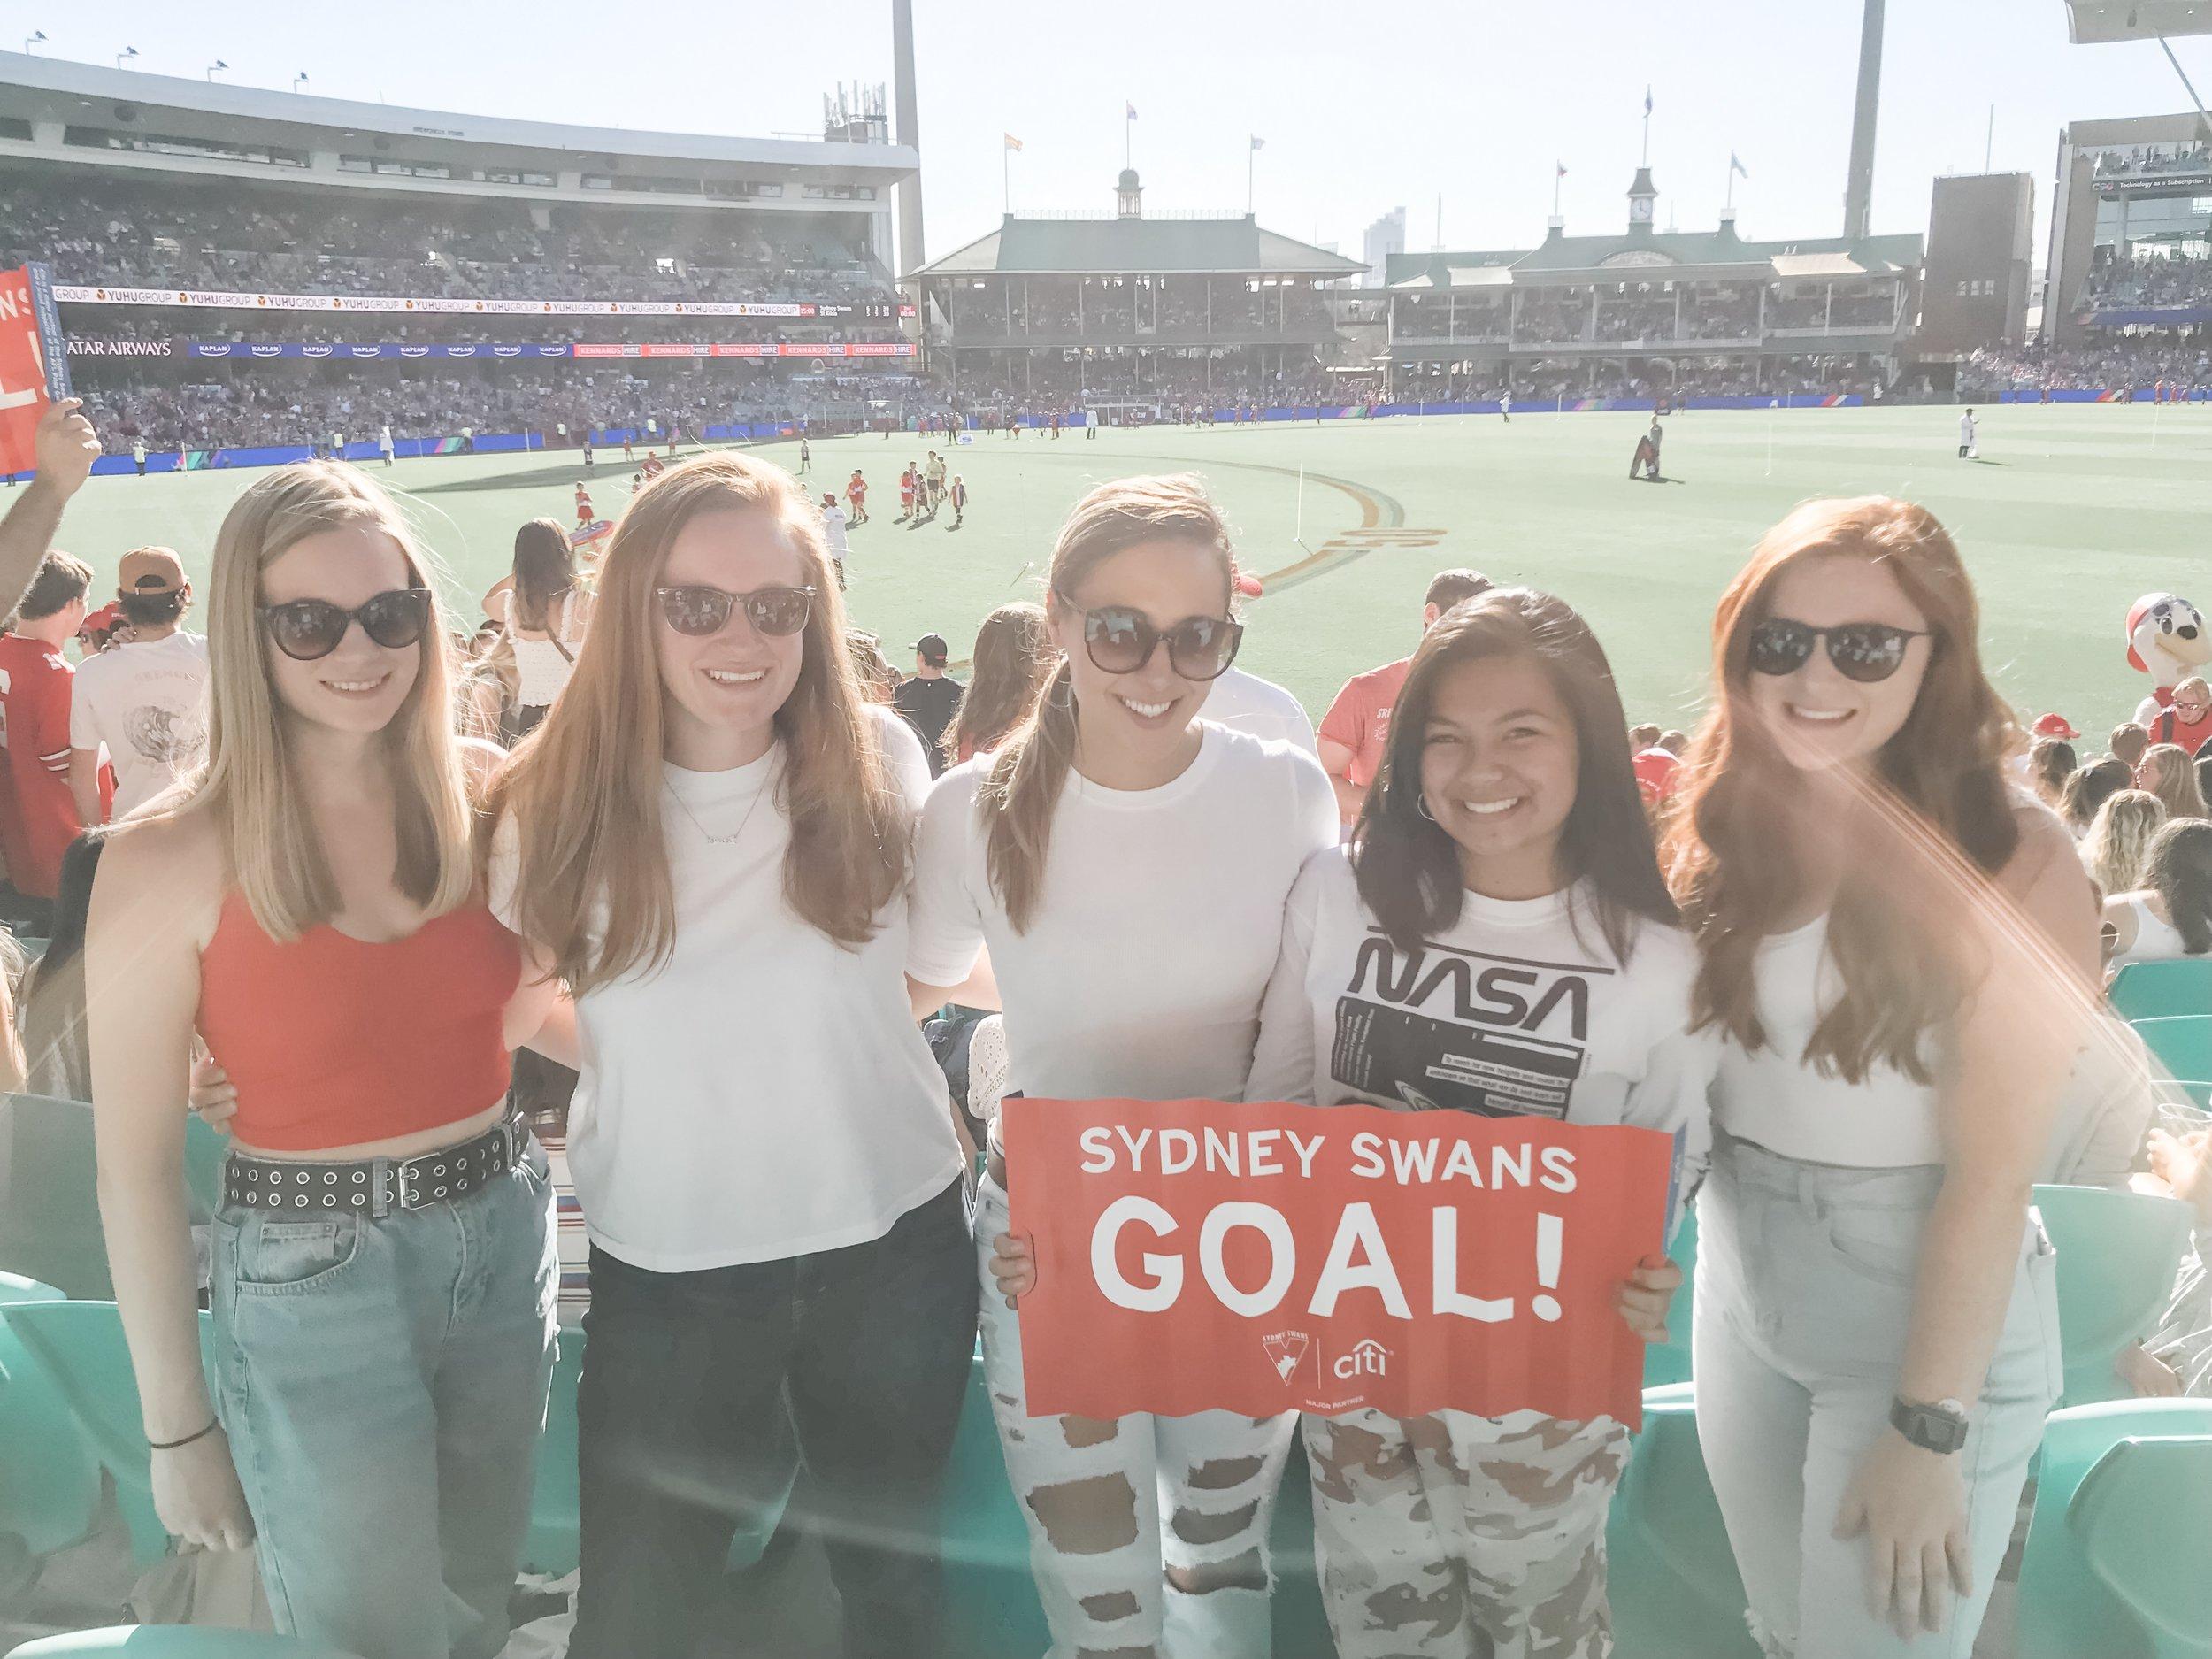 Sydney Swans won!